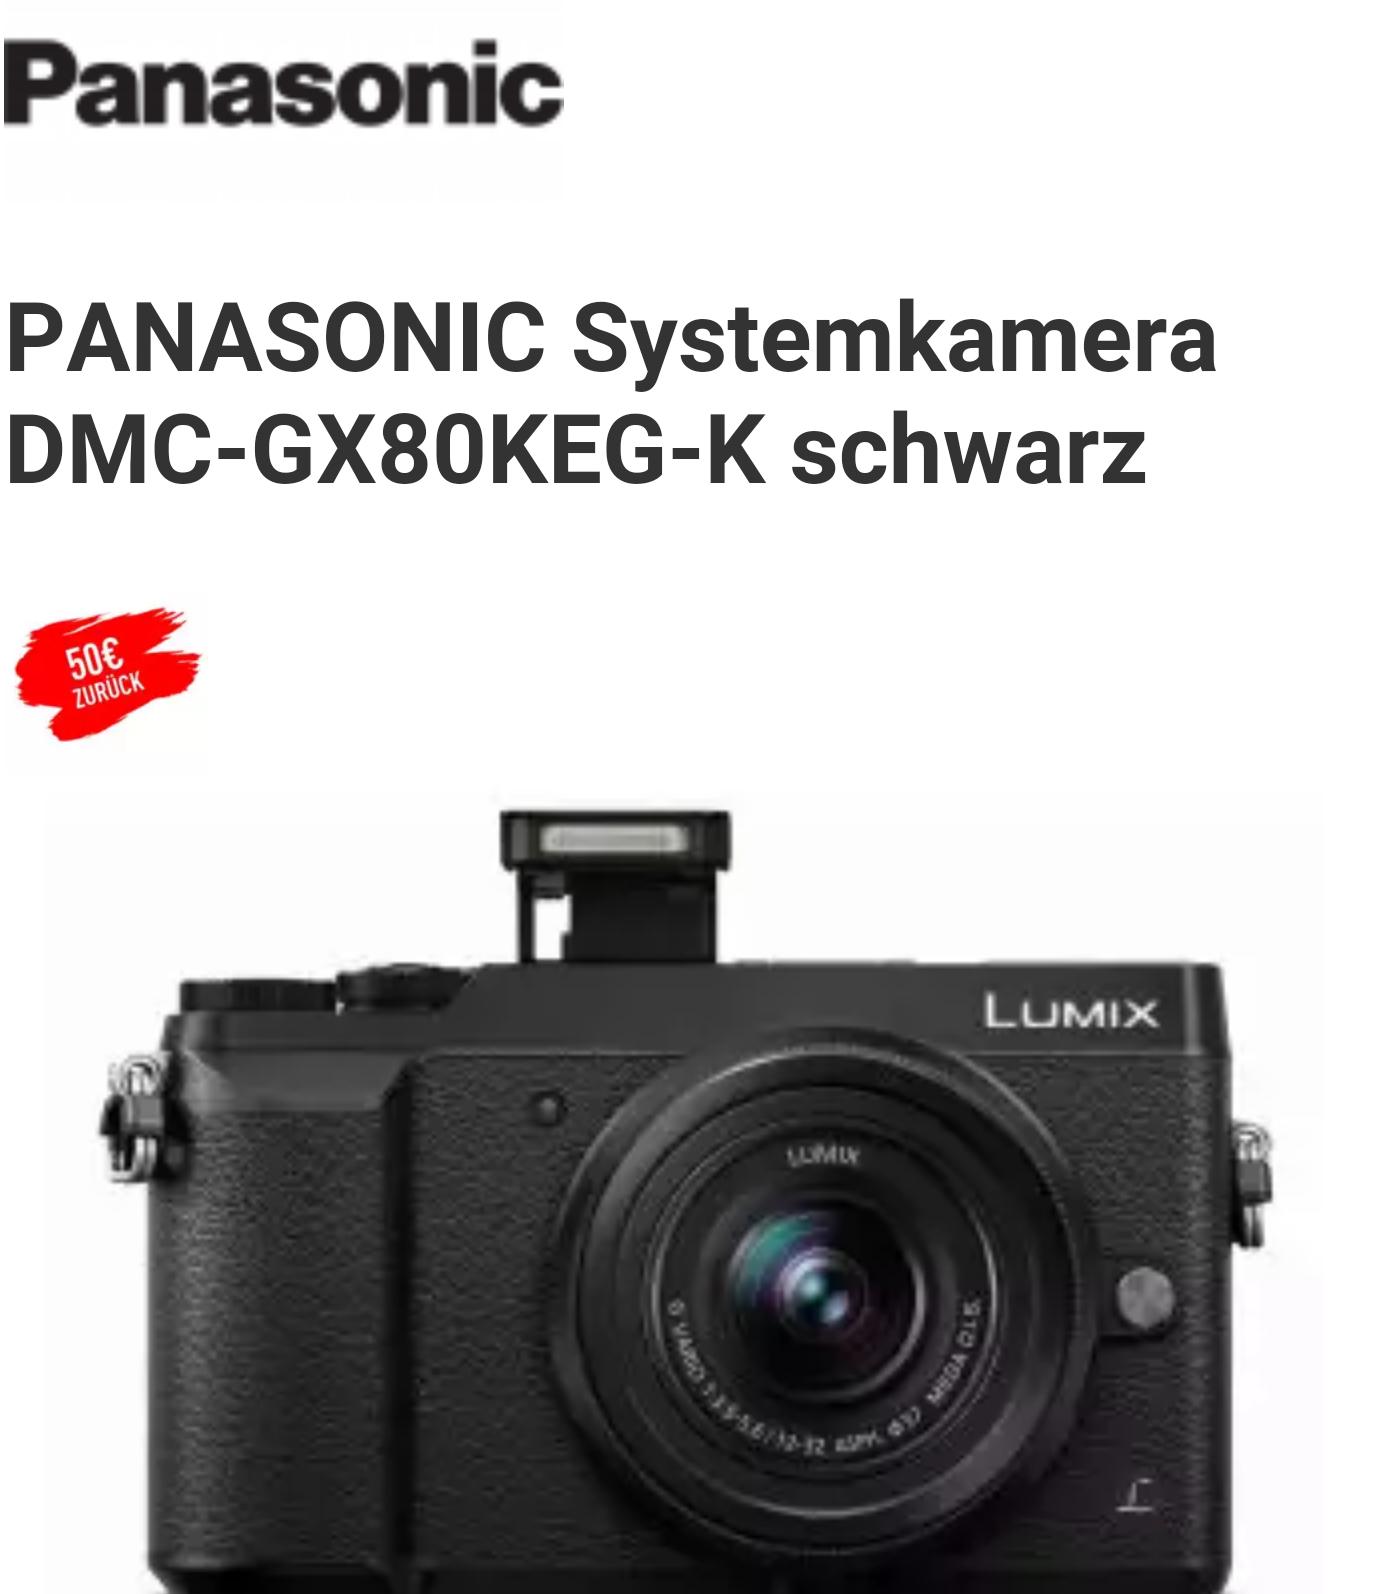 [Expert ESC] Panasonic Lumix DMC-GX 80 Kit 12 - 32 mm, 50 € Cashback möglich